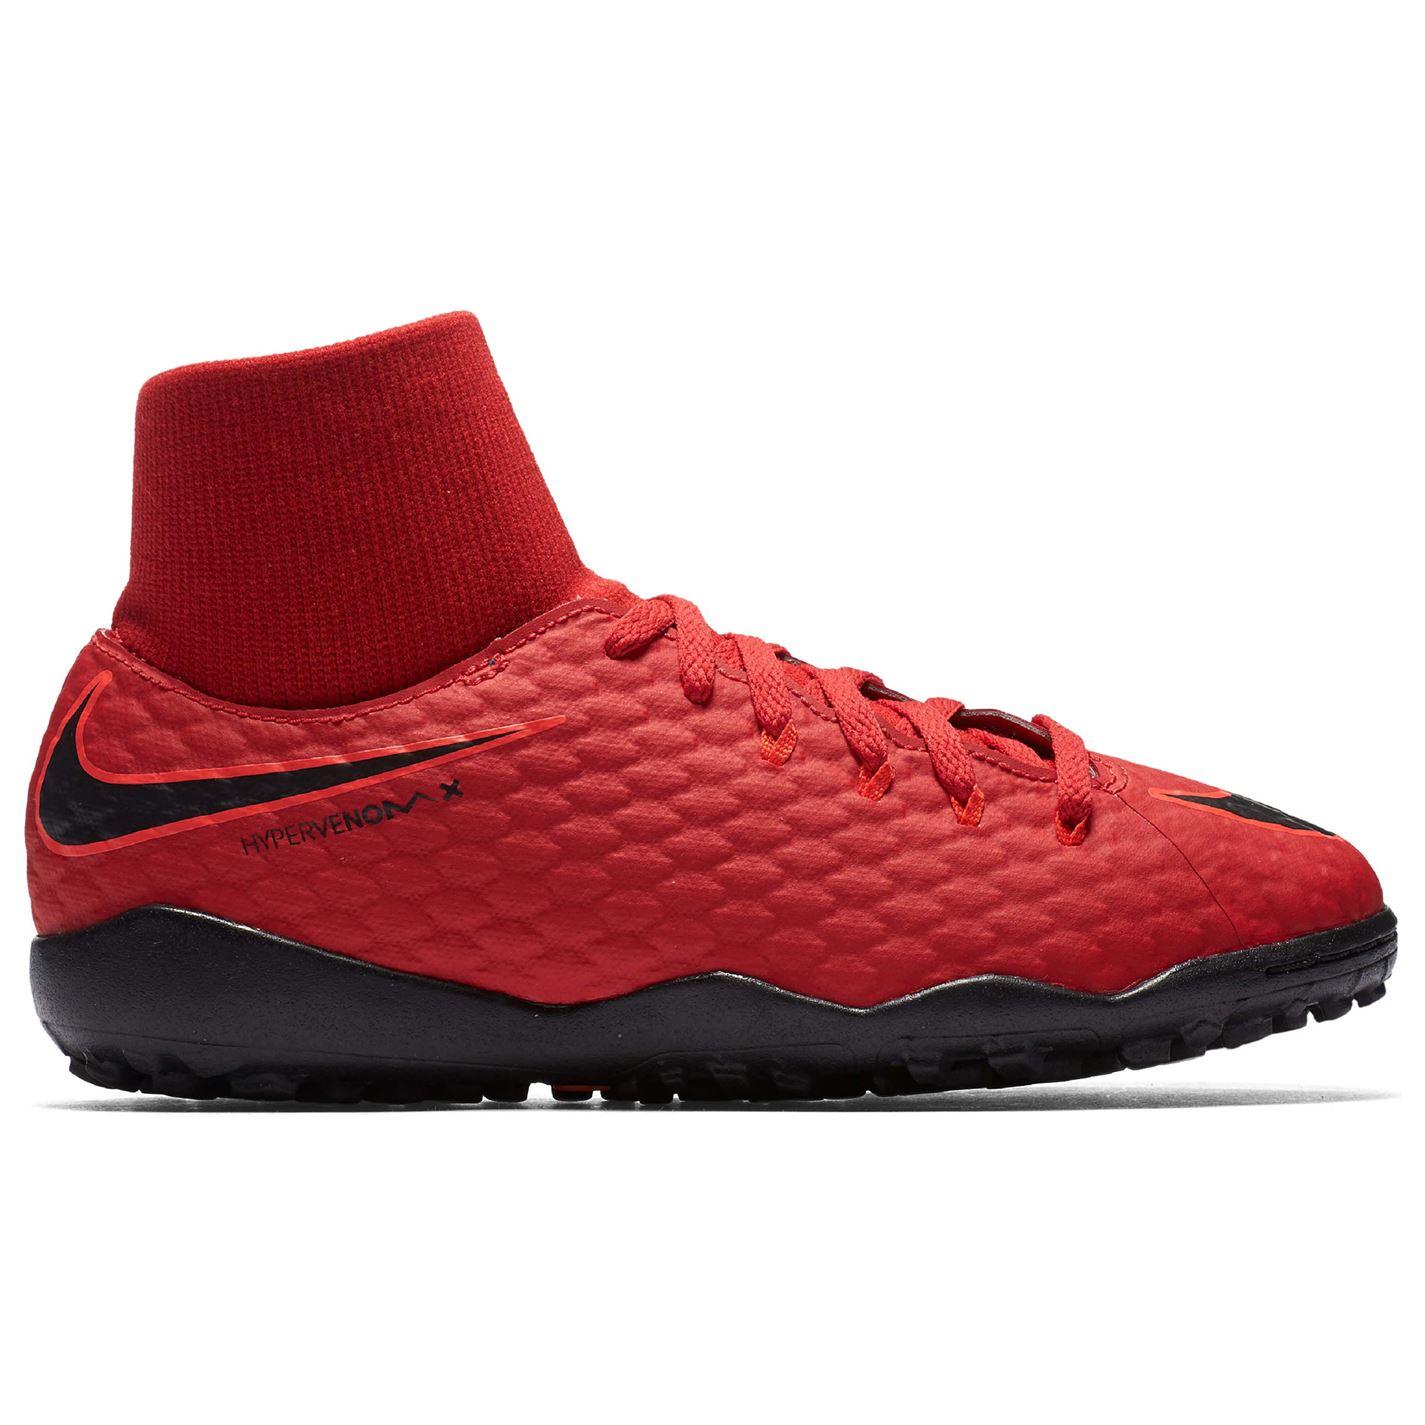 Nike Hypervenom Phelon DF Junior Astro Turf Trainers